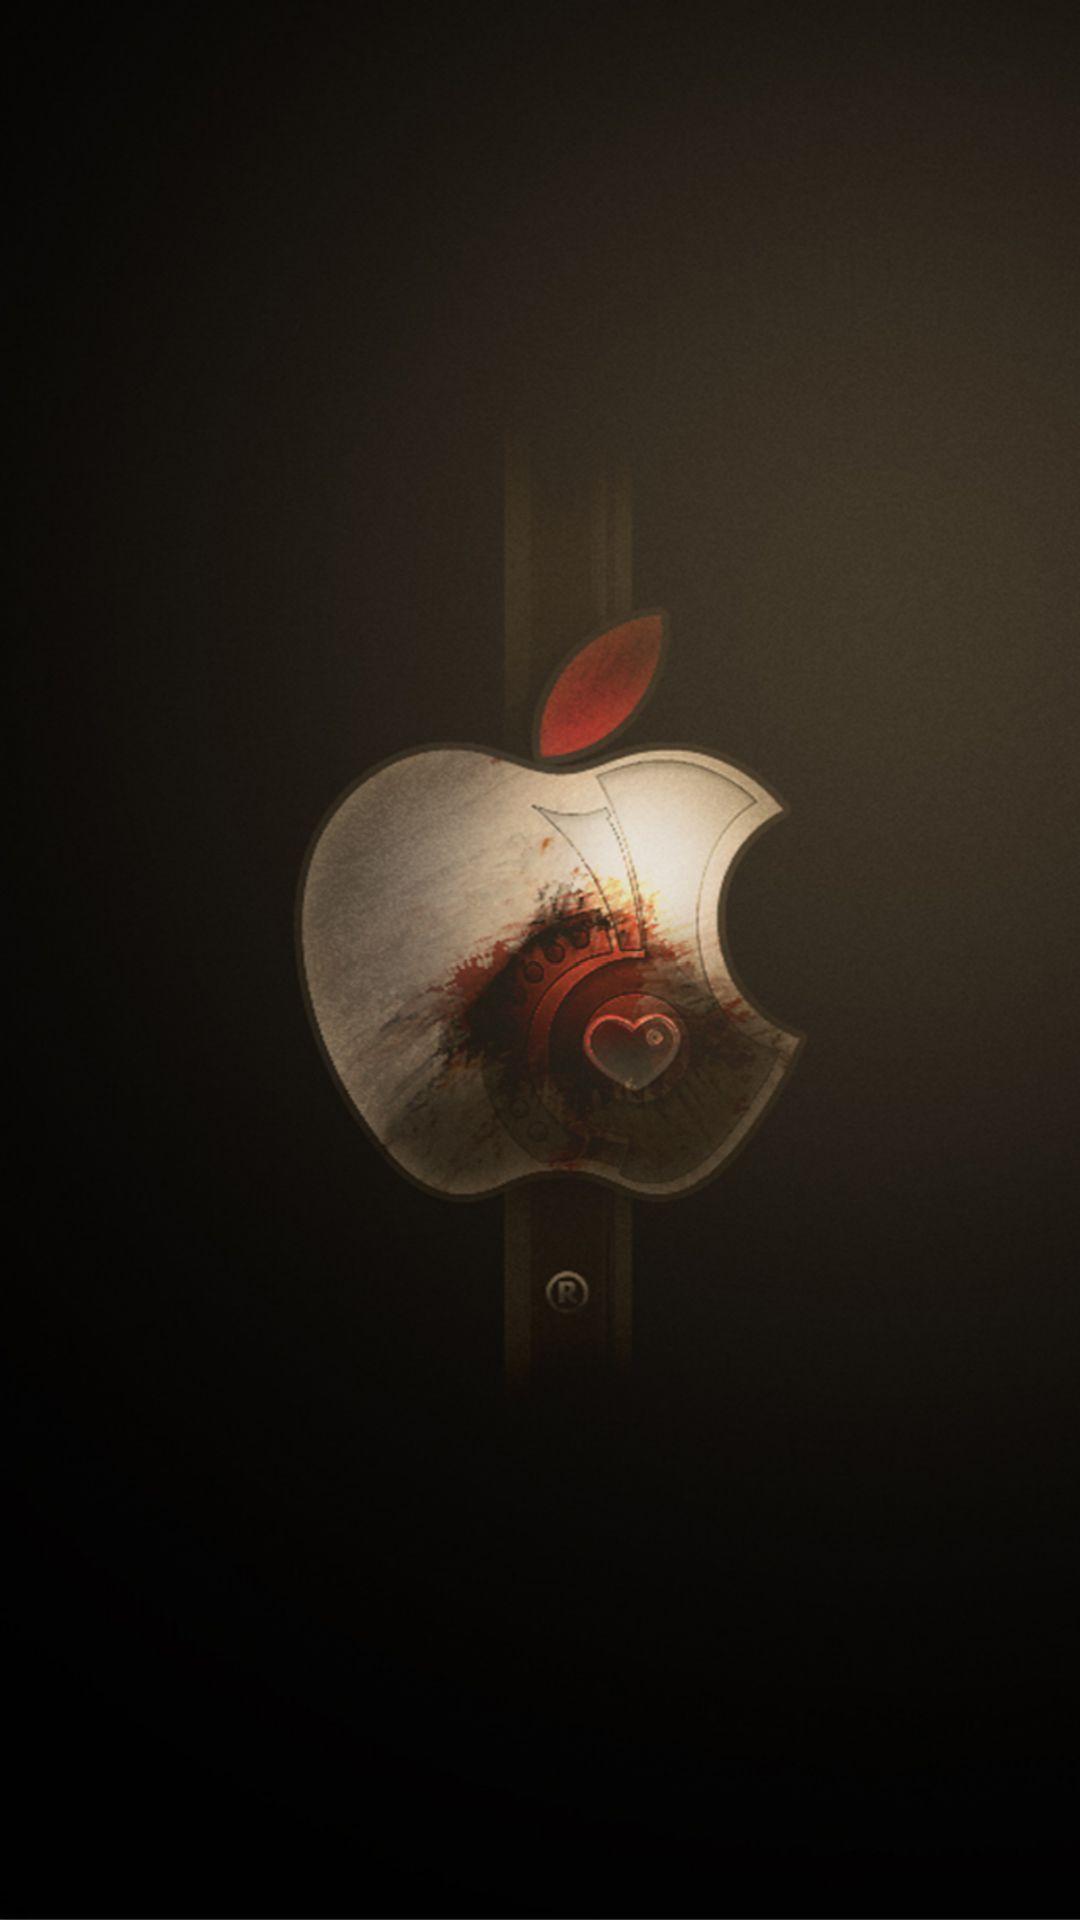 25 Apple Iphone 8 Wallpapers On Wallpapersafari